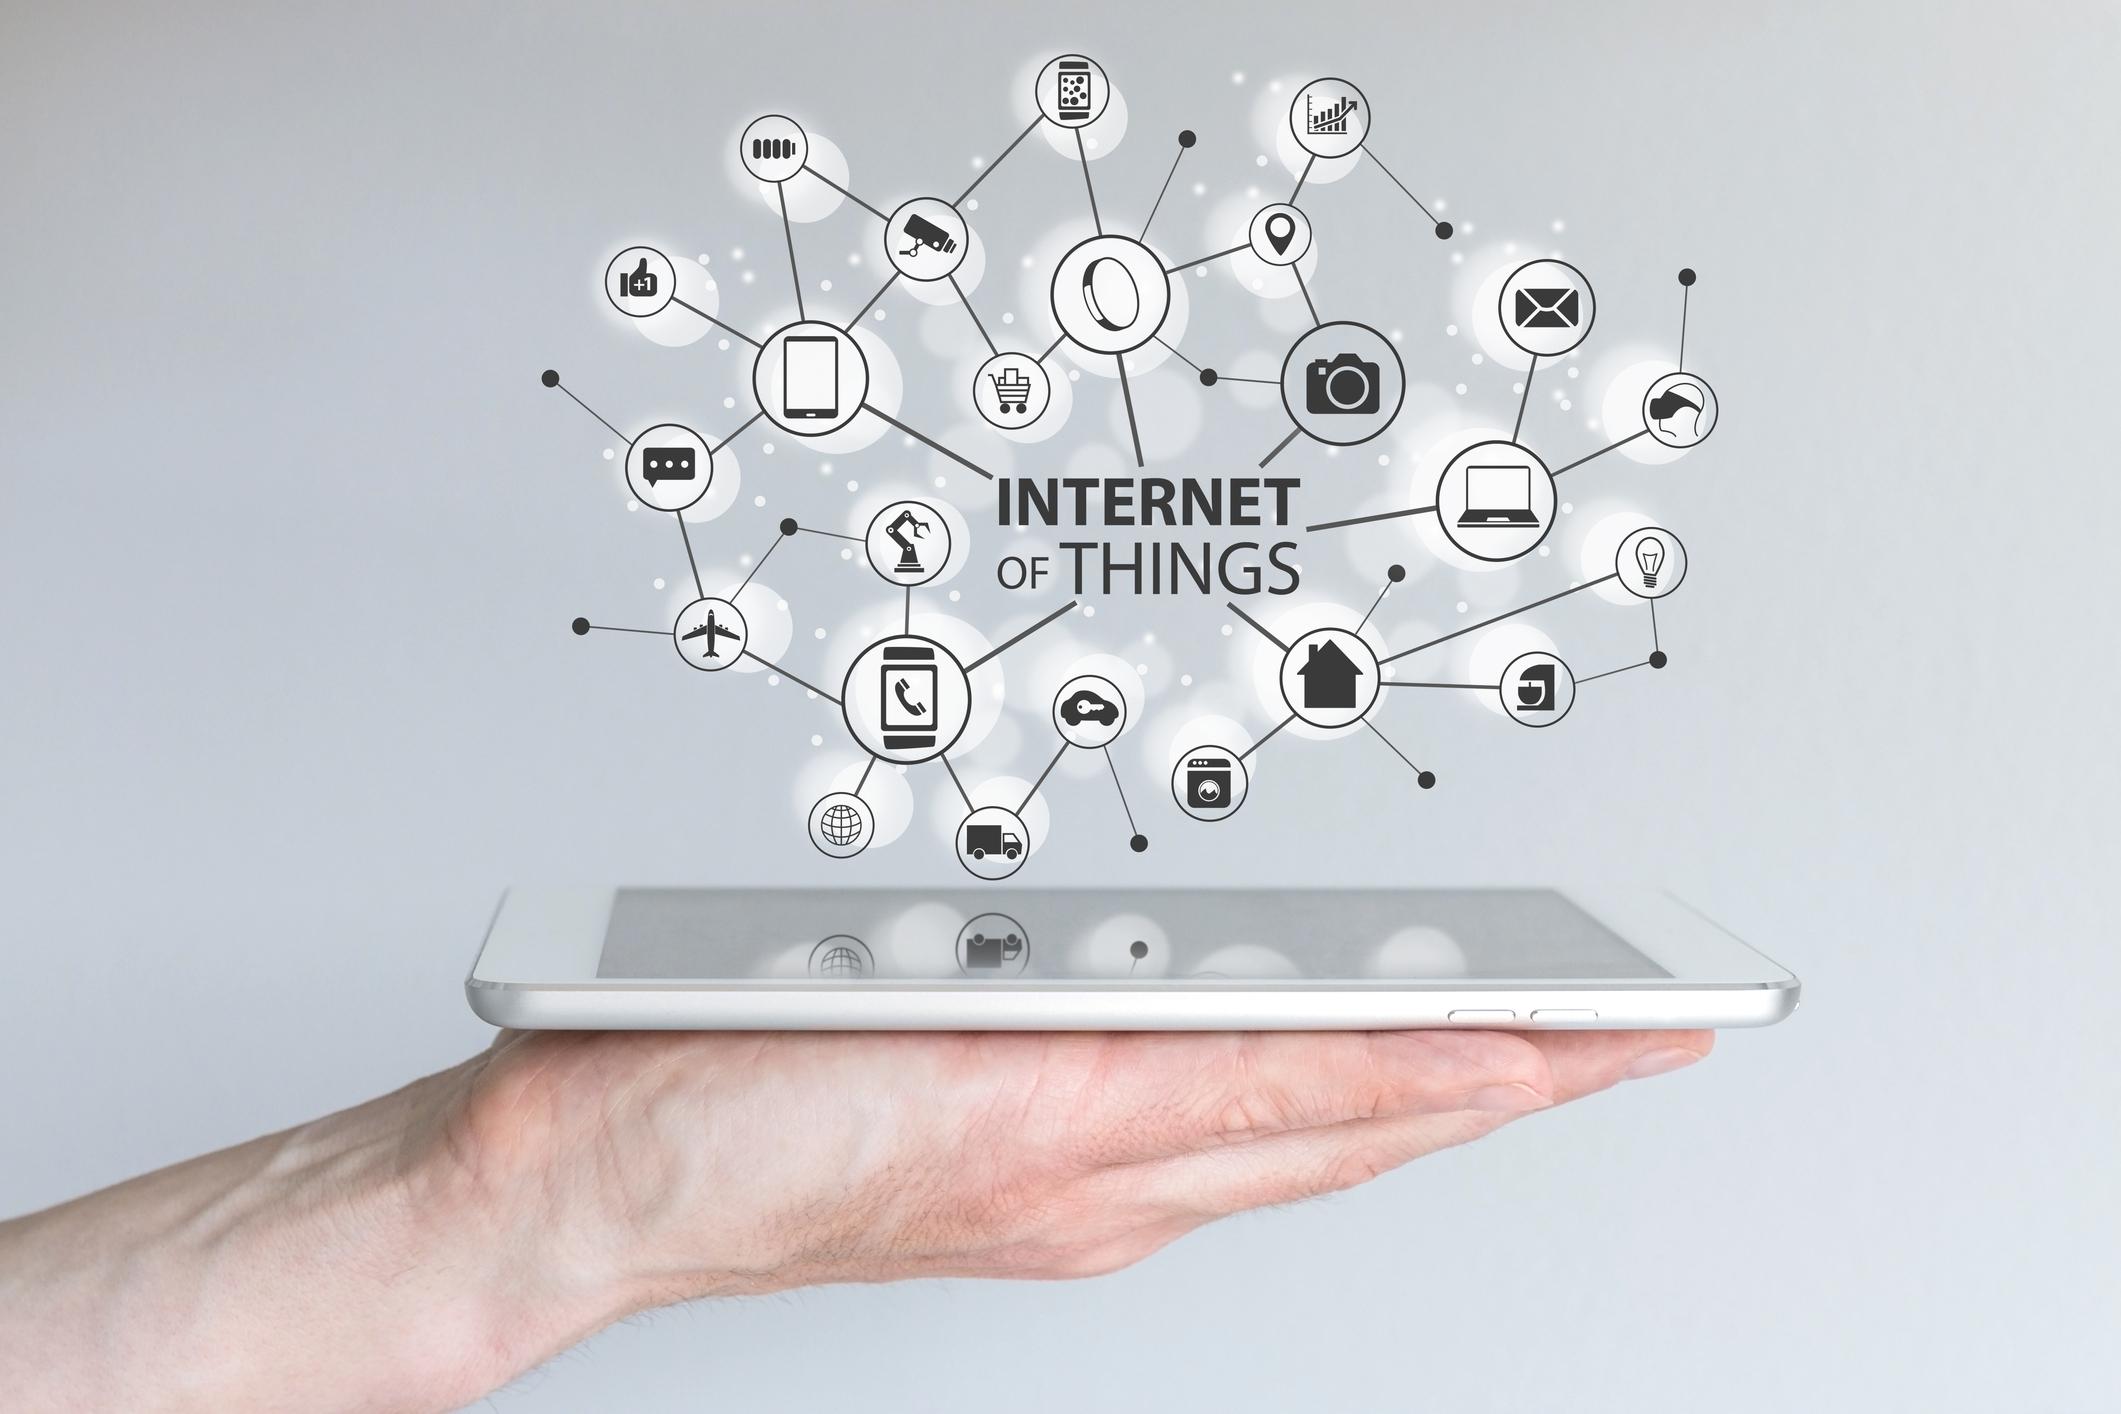 UK_LAN_IoT Connectivity Stock_151019